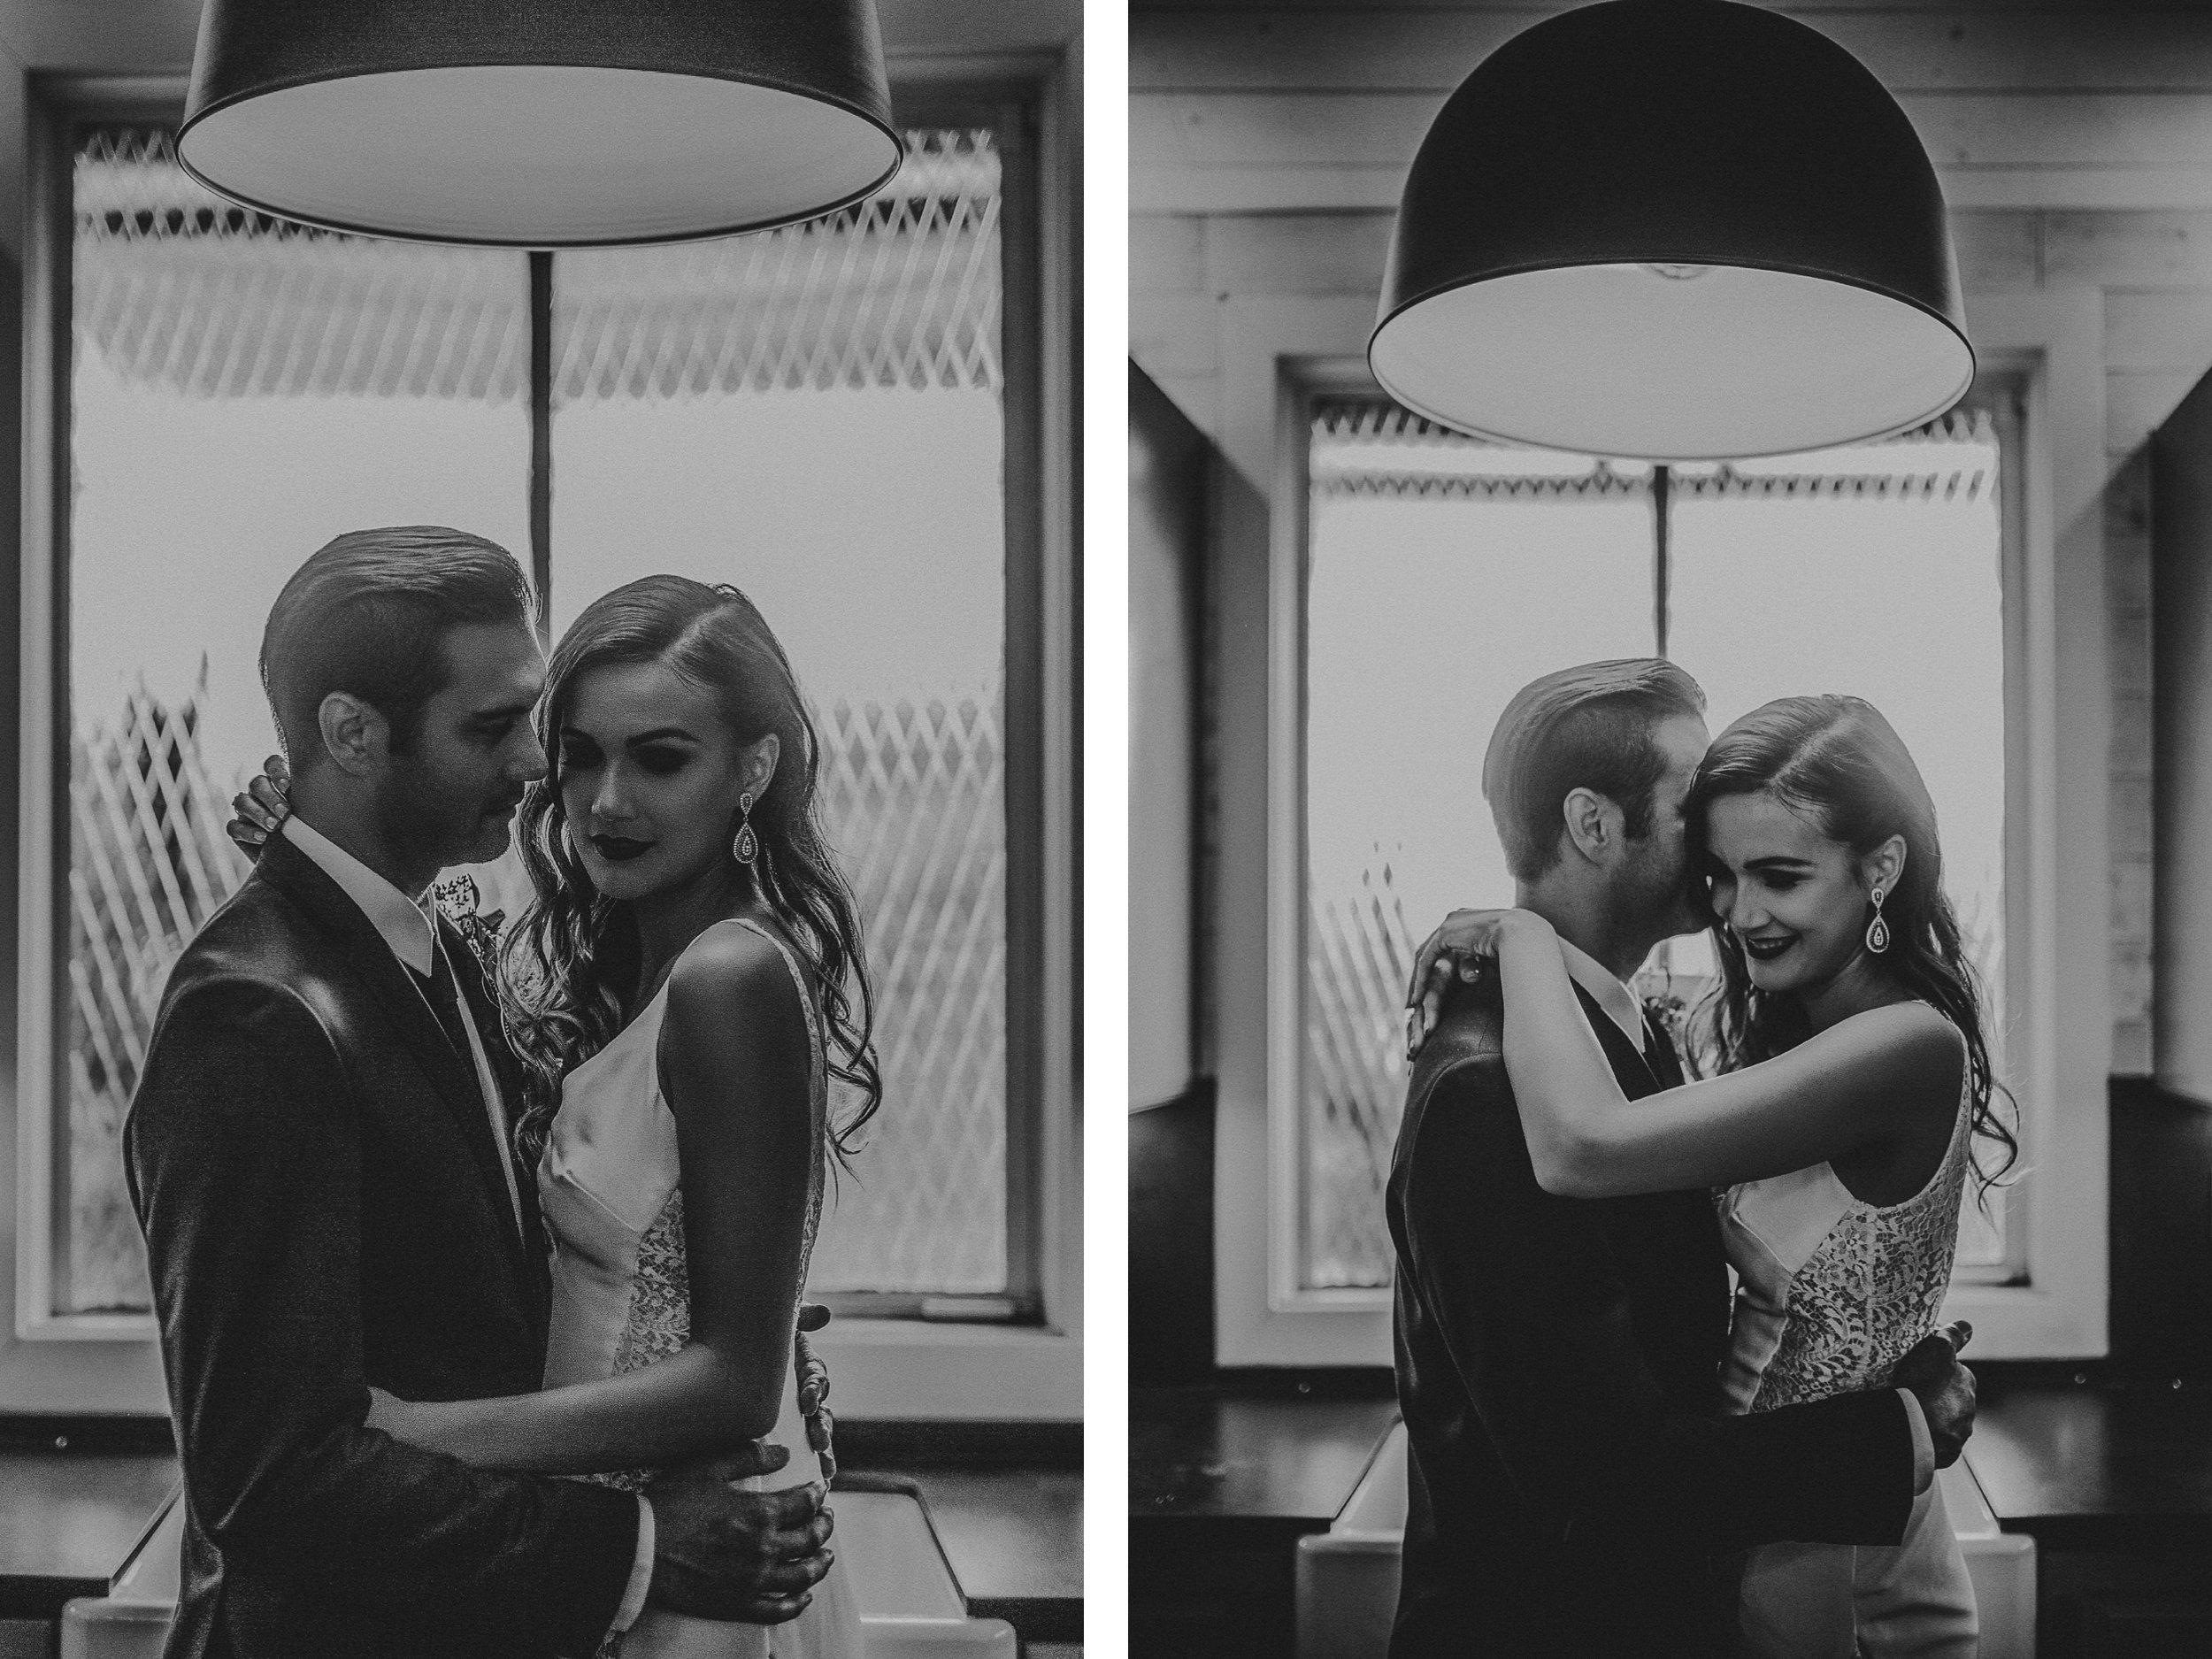 san diego wedding   photographer   bride and groom monotone shot under lighting